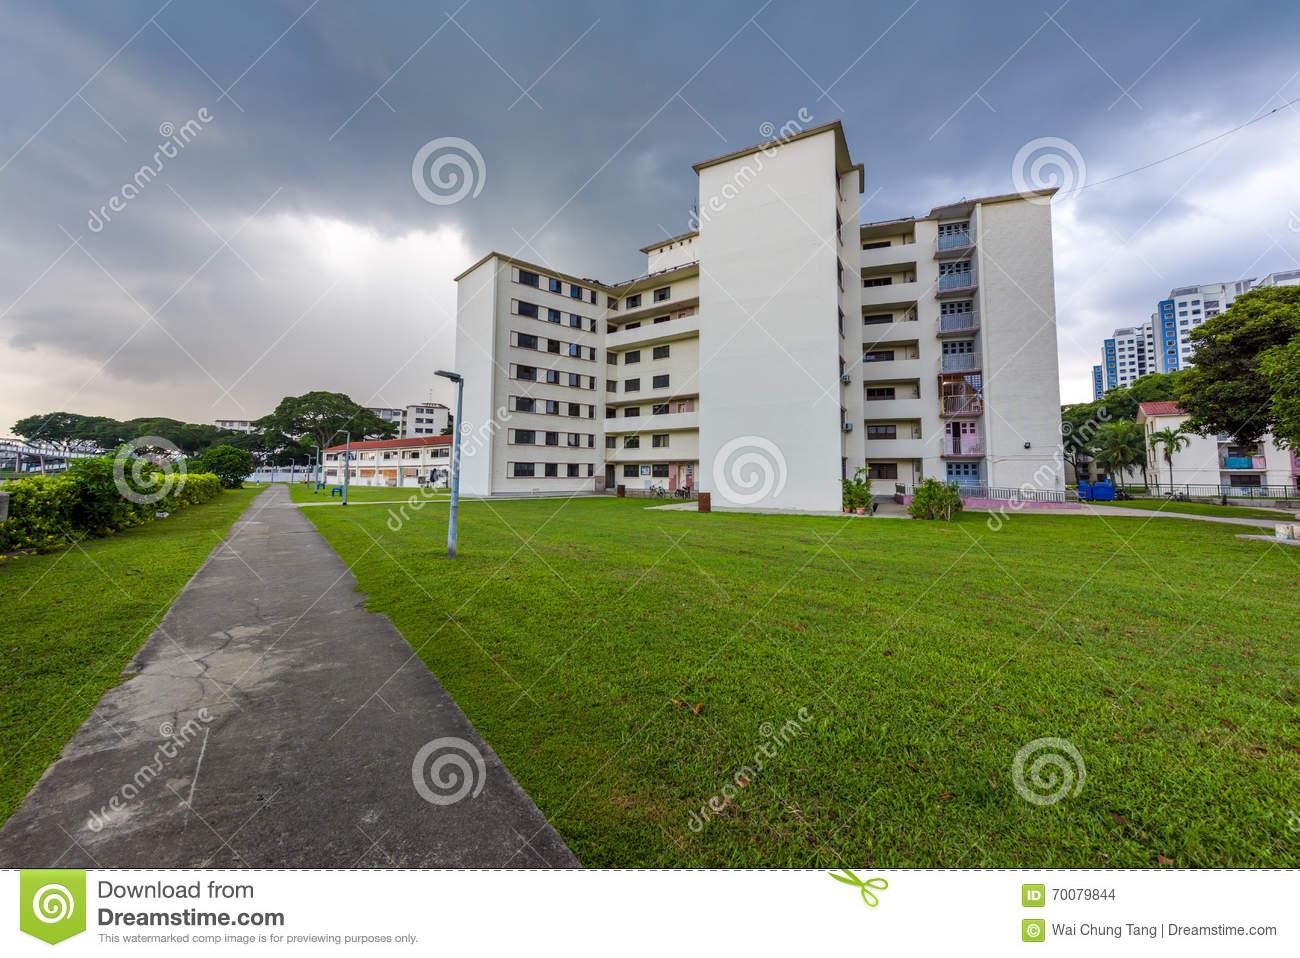 Old public housing in Singapore before demolishment